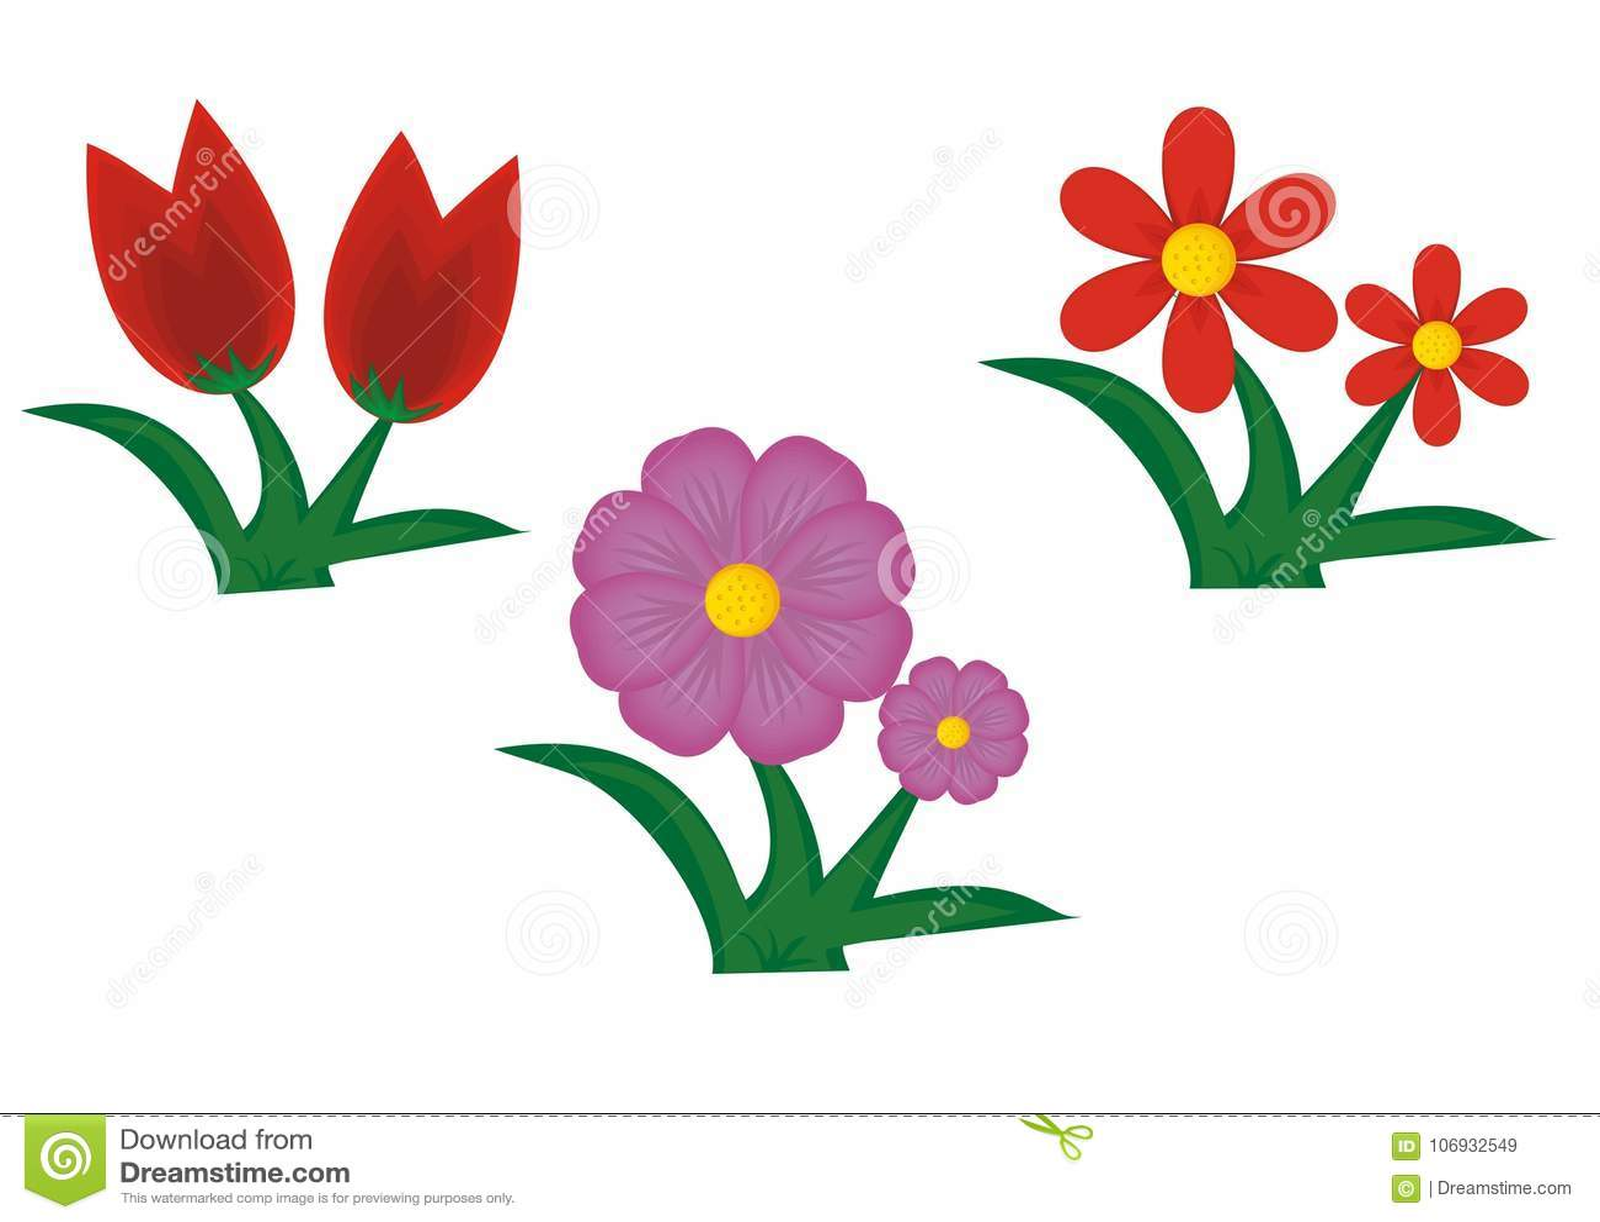 Flower cute cartoon stock illustration illustration of decorative flower cute cartoon izmirmasajfo